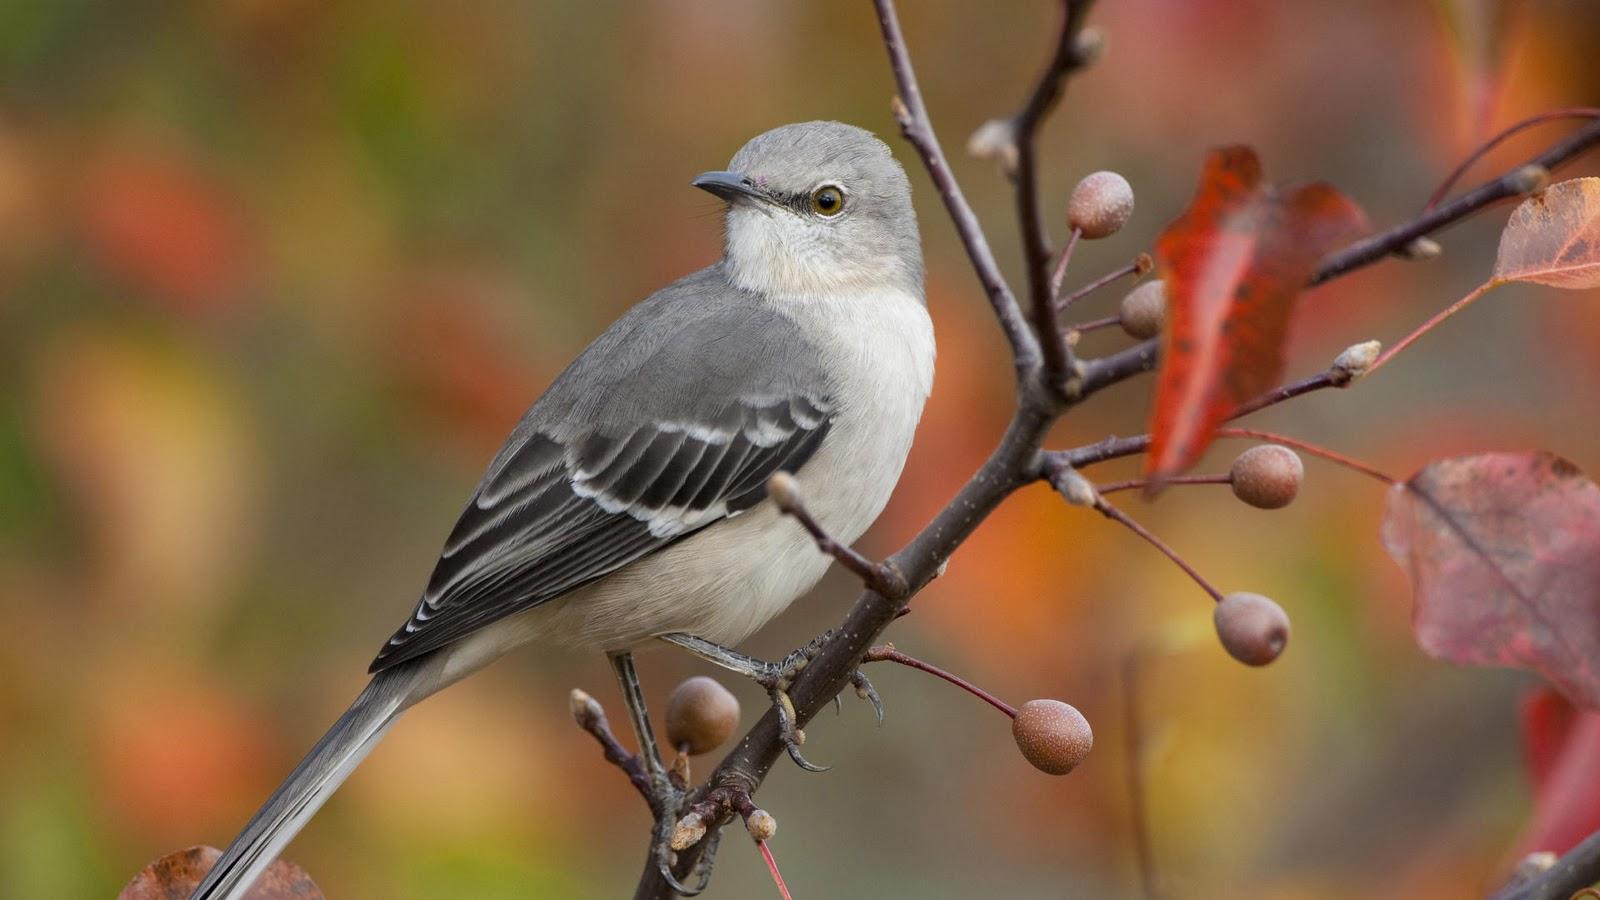 http://2.bp.blogspot.com/-thkIxg0VSMY/TwaiJyizghI/AAAAAAAABC4/yW3tCu_JywI/s1600/Best-top-desktop-birds-wallpapers-hd-bird-wallpaper-picture-image-photo-1.jpg